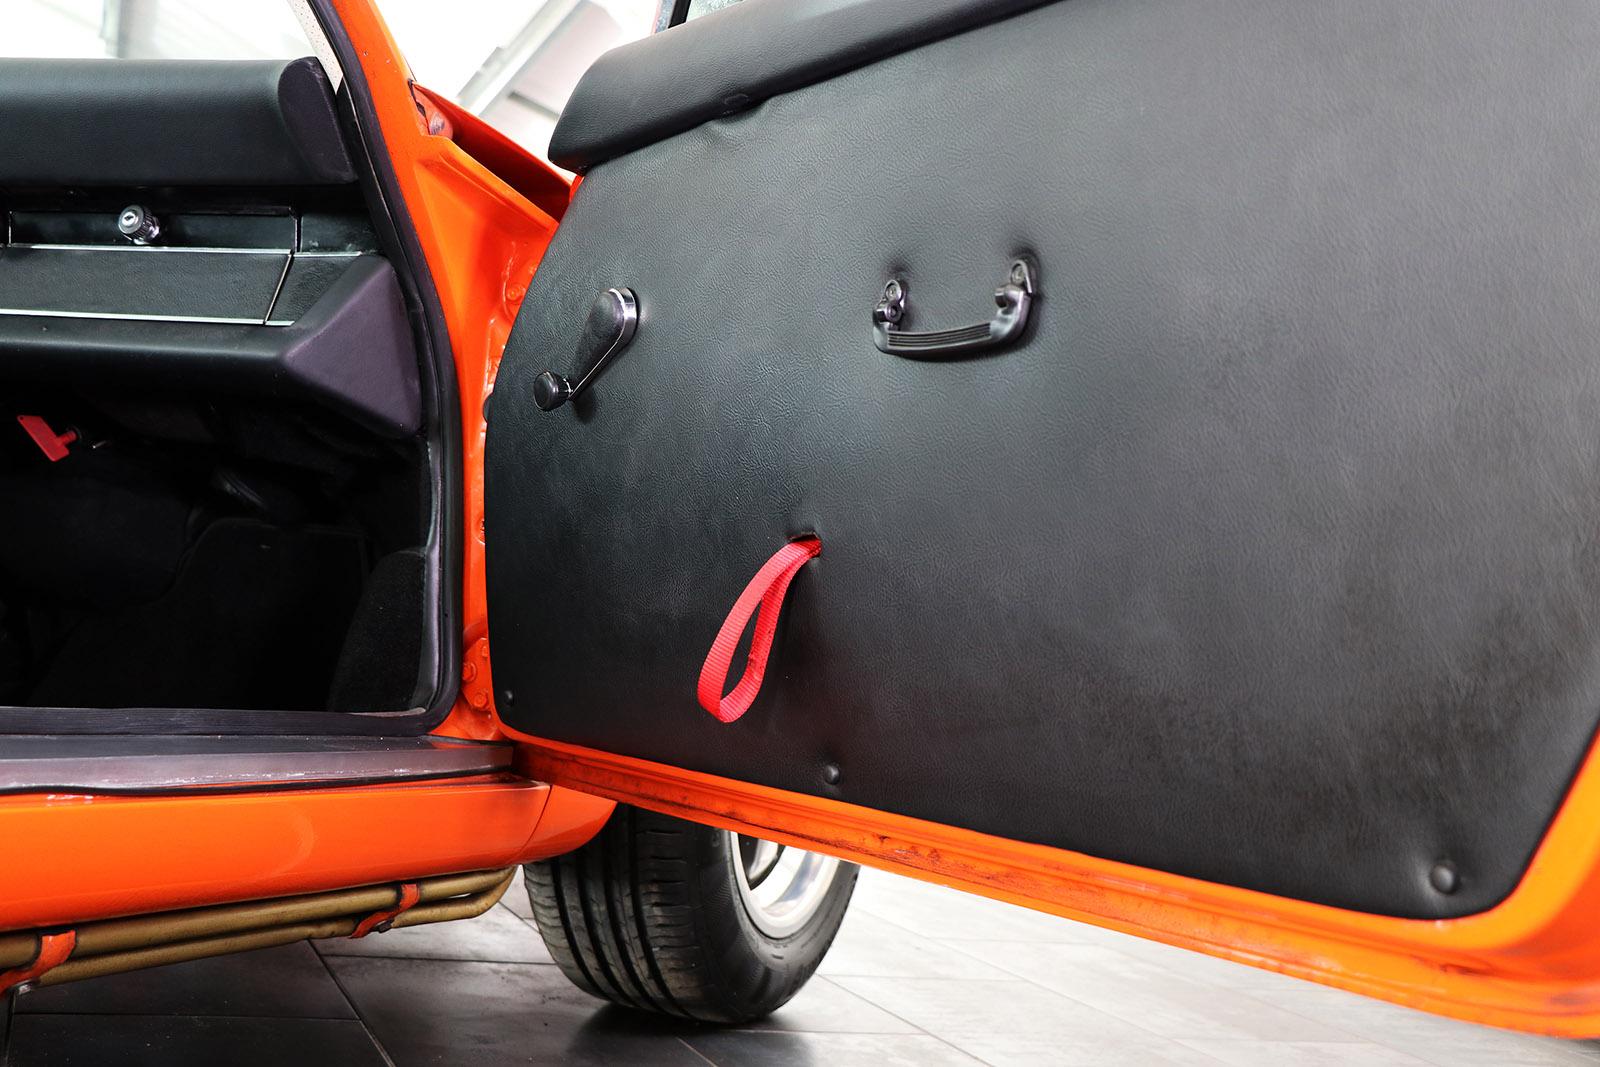 1972-Porsche 911 S-orange-evocation-sayer selection-16-web.jpg